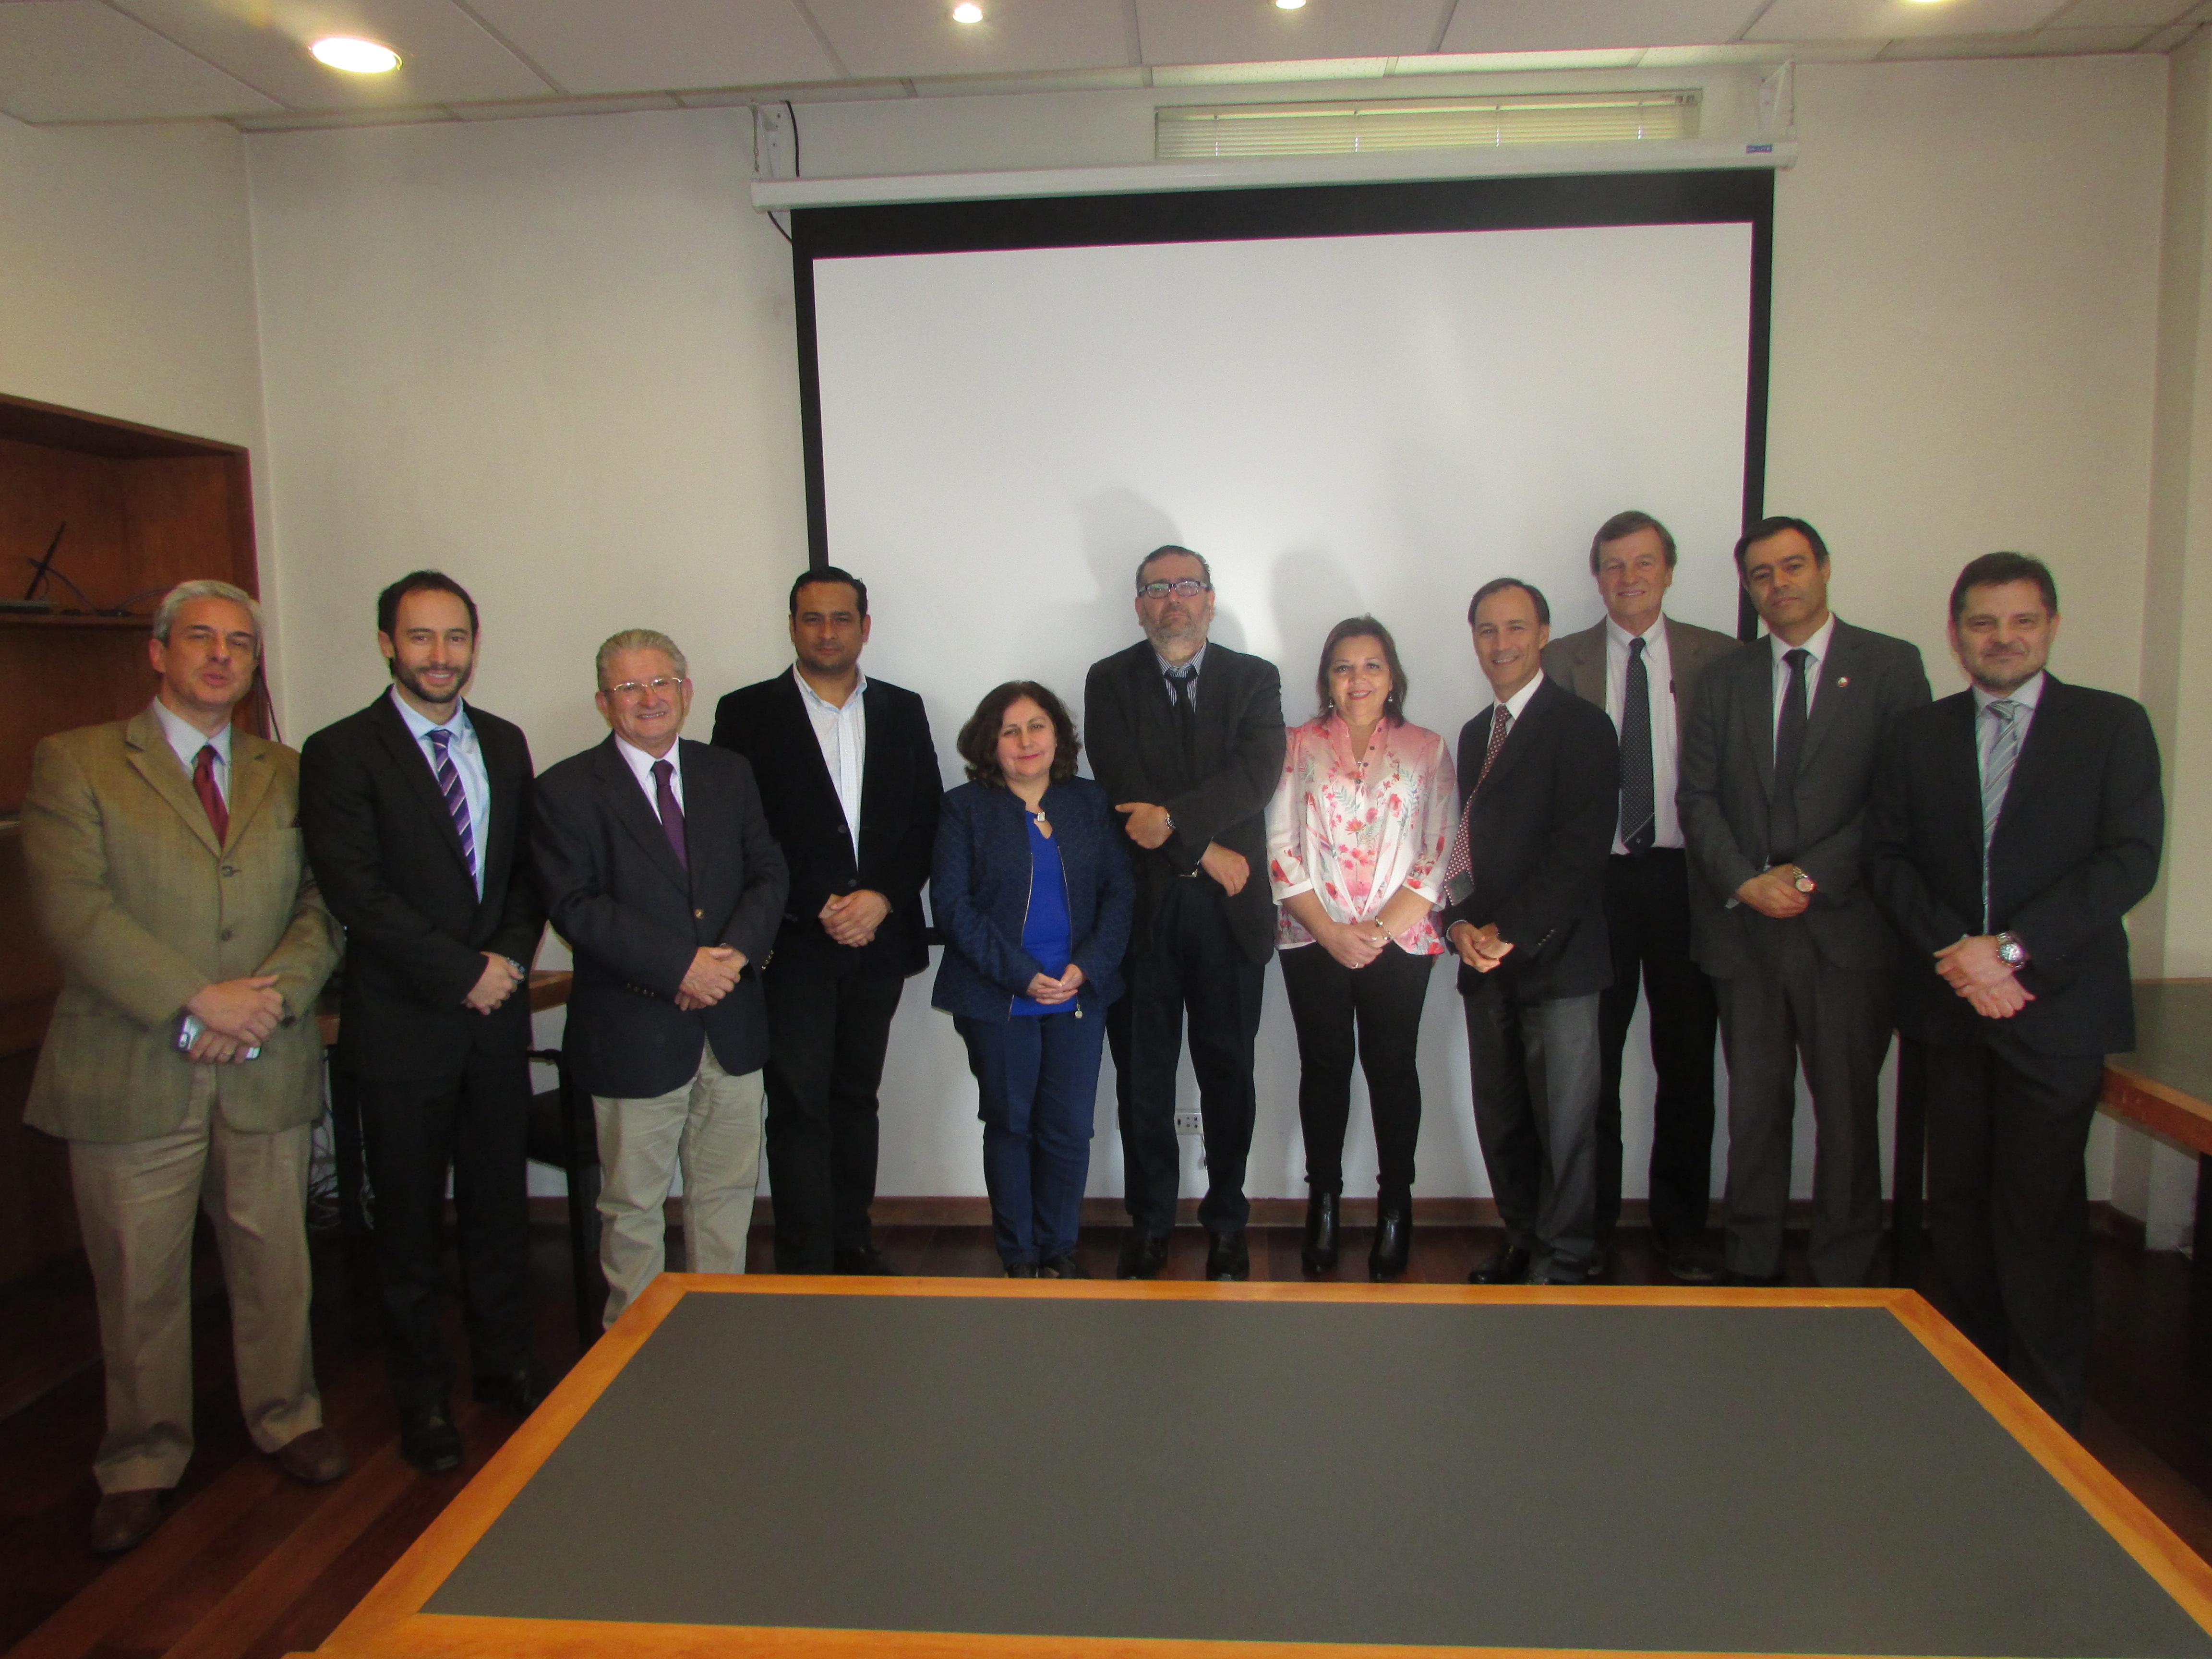 FTH con Jefe de Gabinete del Ministro de Hacienda, Francisco Matte – 12 Abril 2018